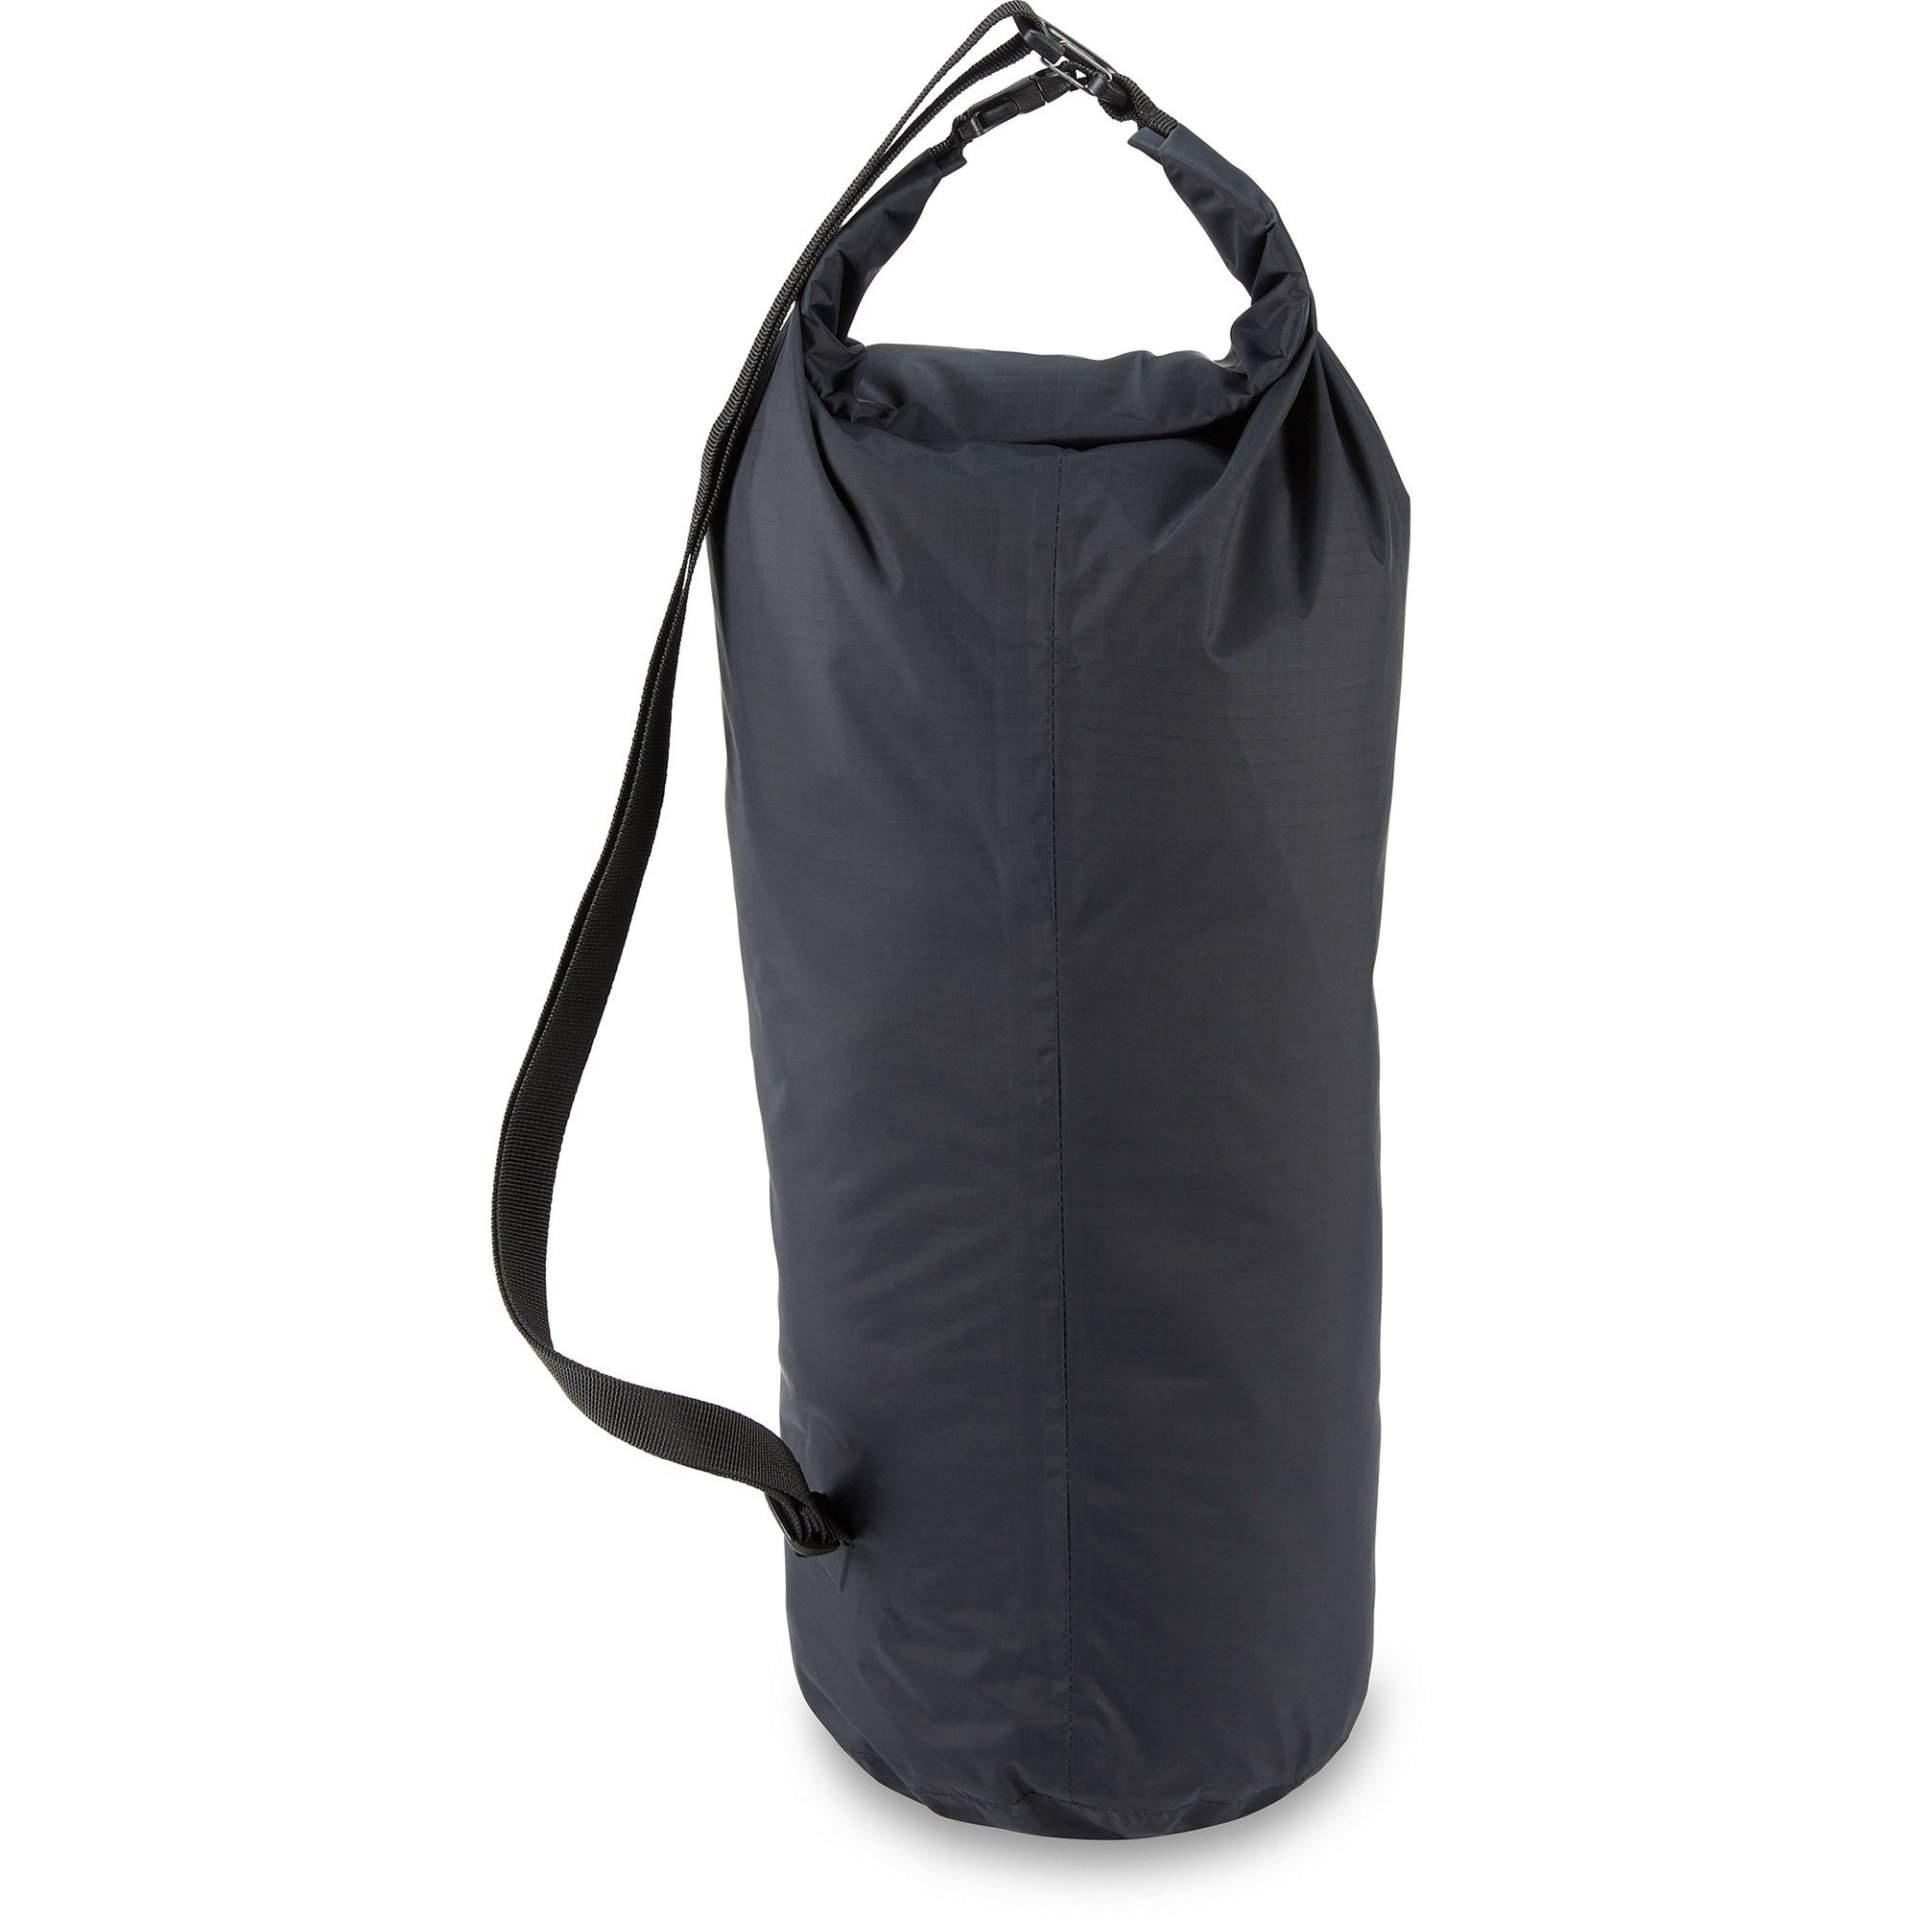 PLECAK DAKINE PACKABLE ROLLTOP DRY BAG 20L BLACK 2